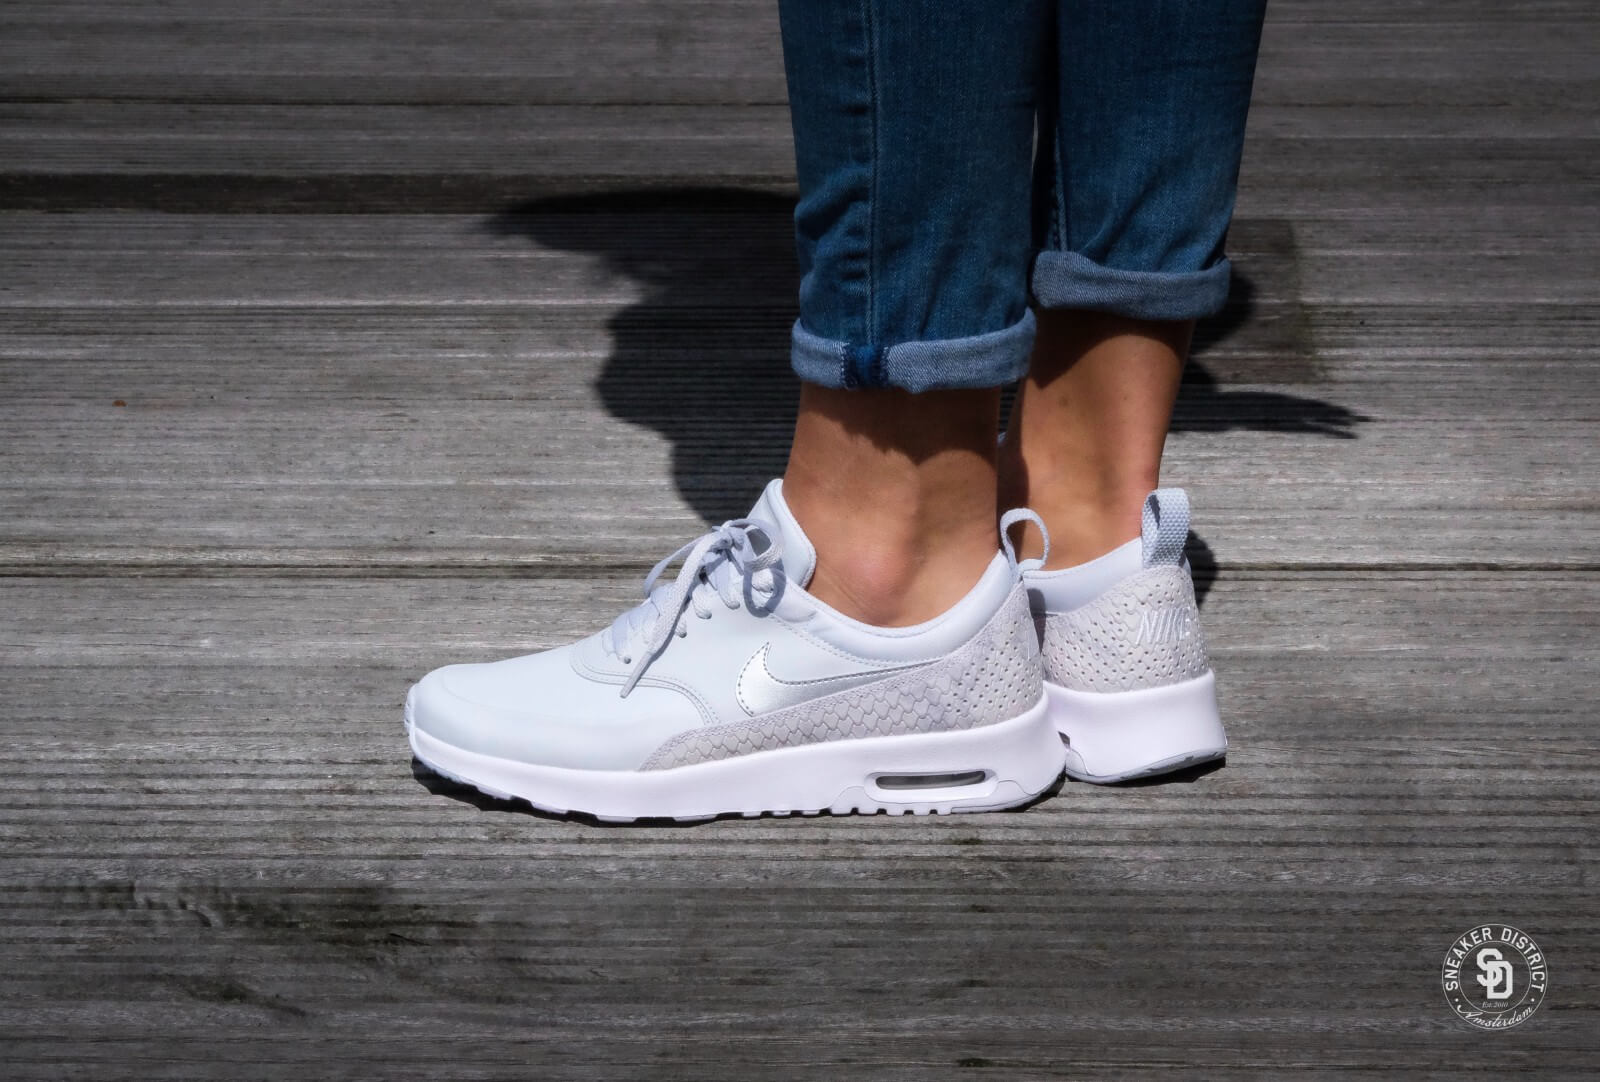 Nike Wmns Air Max Thea PRM Pure Platinum Pure Platinum White 616723 018